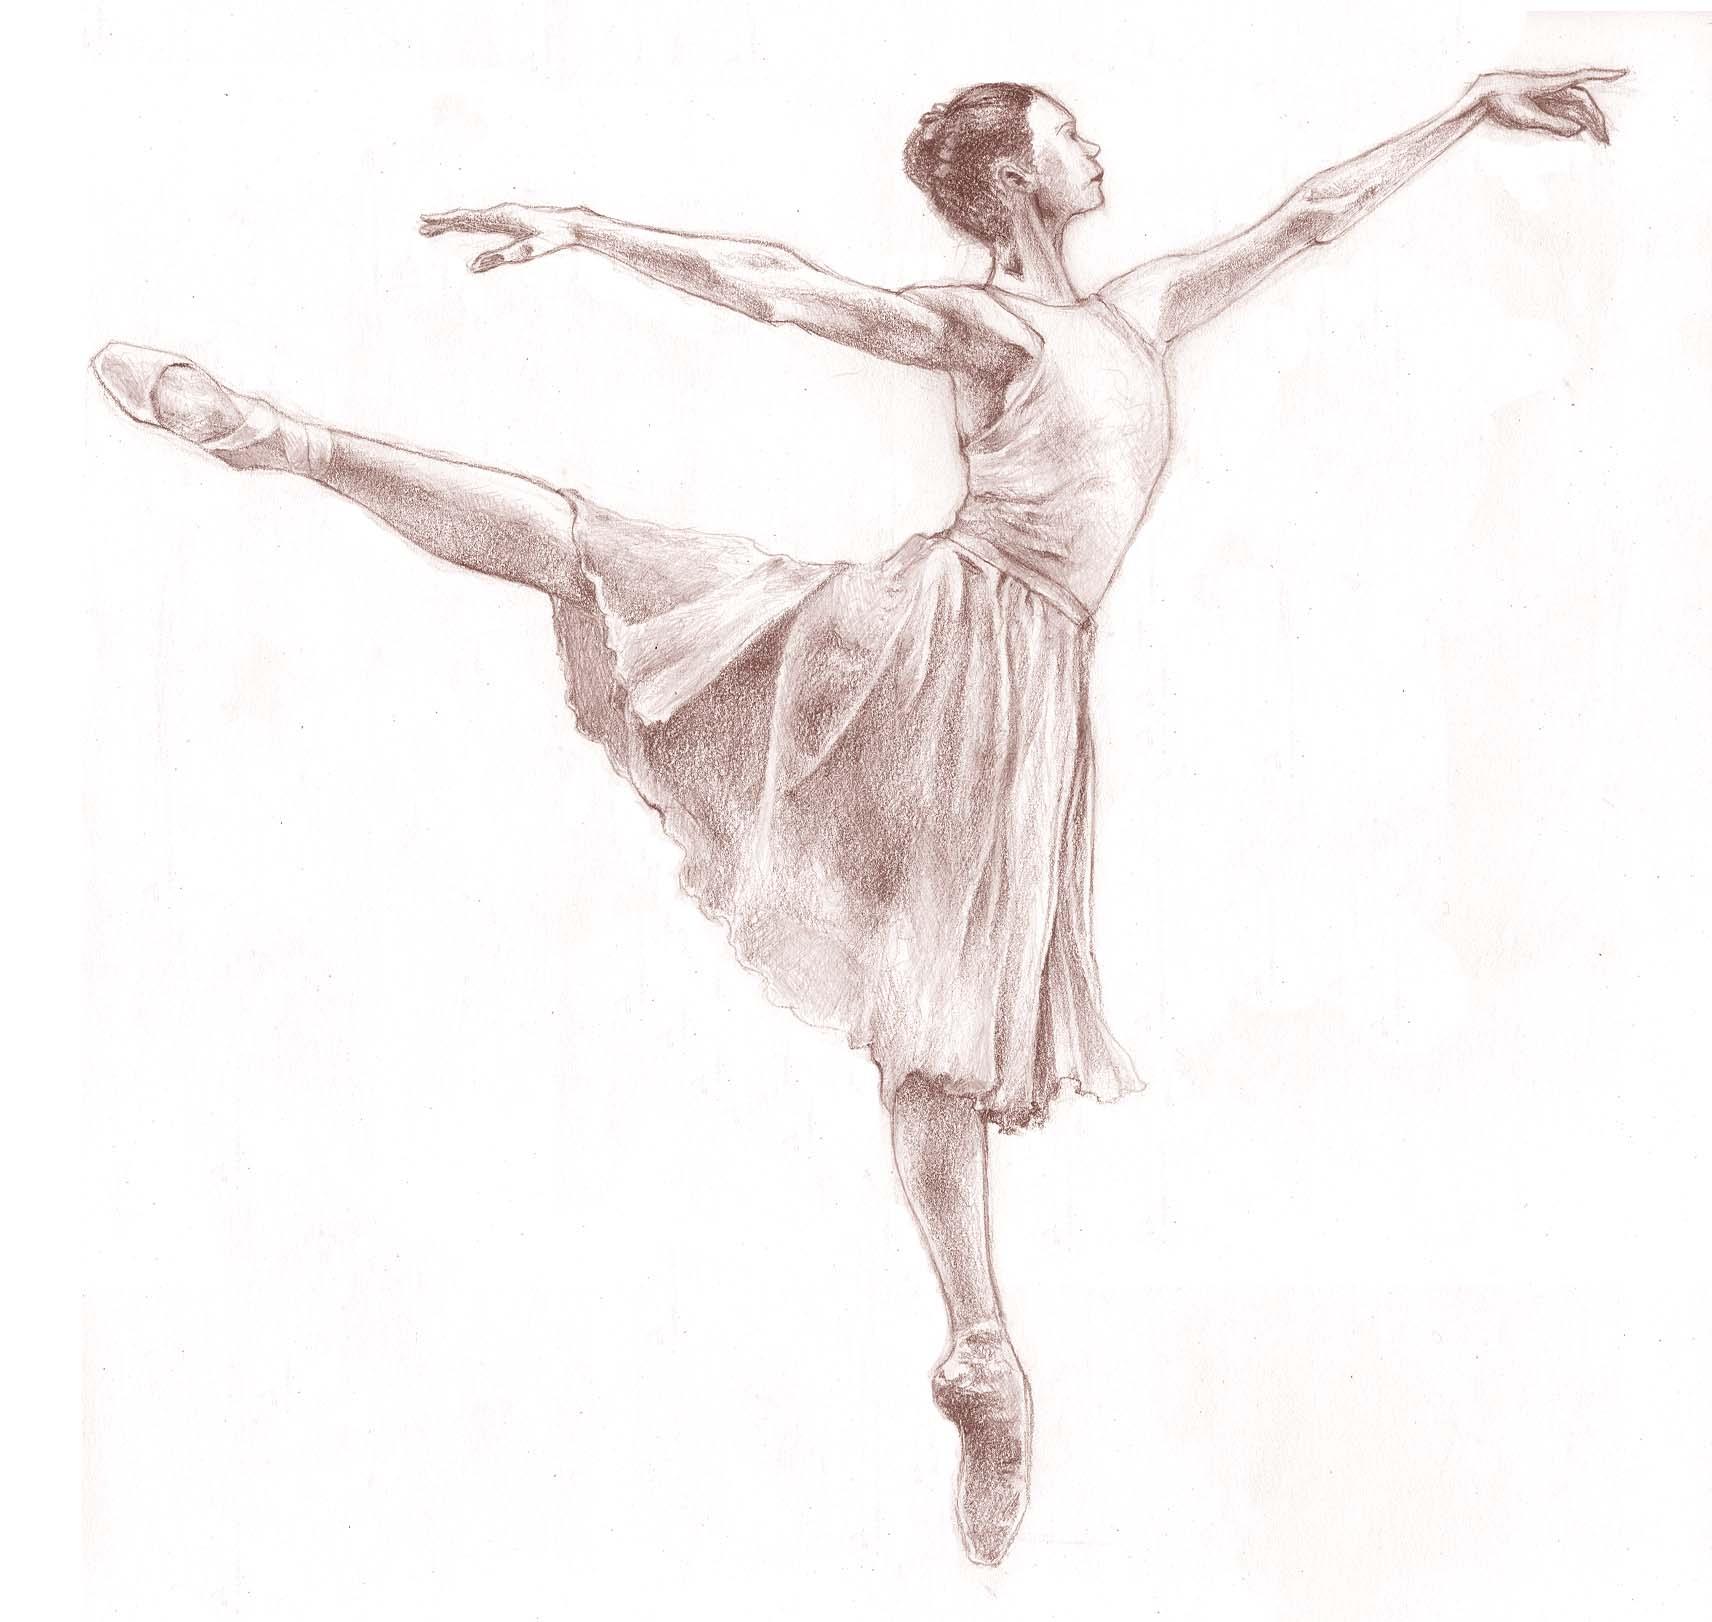 Drawn ballerina people dancing Art/Photo Underneath kids Art/Photo Teen